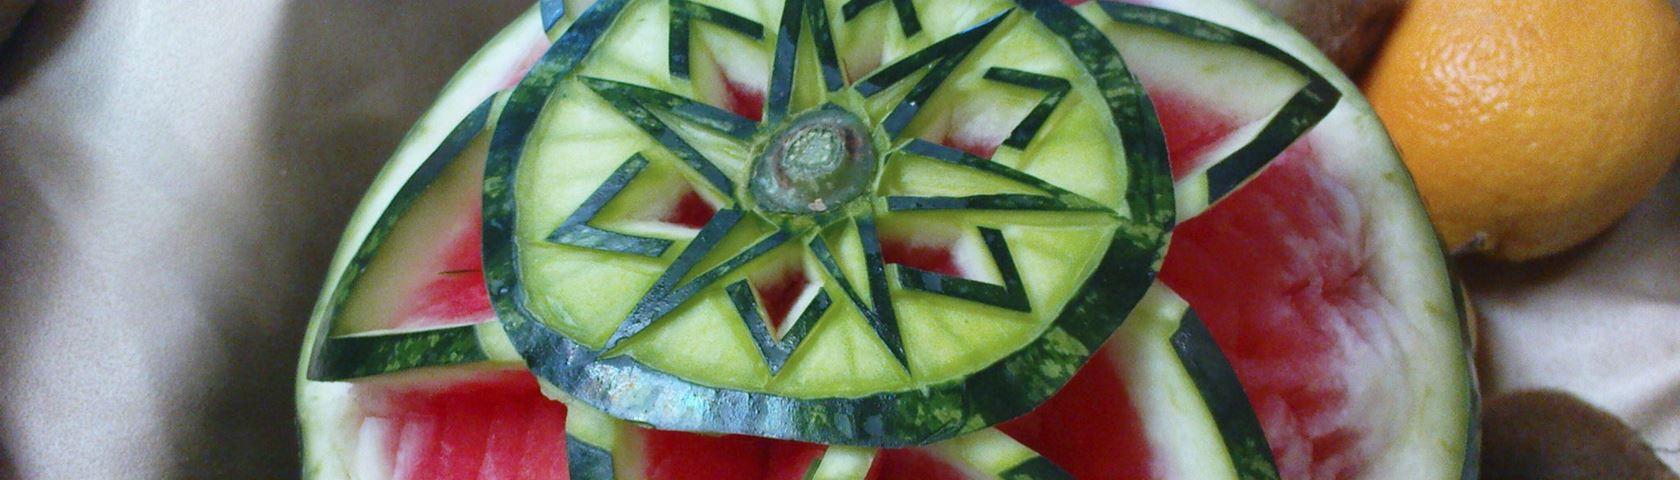 Decorative Watermelon